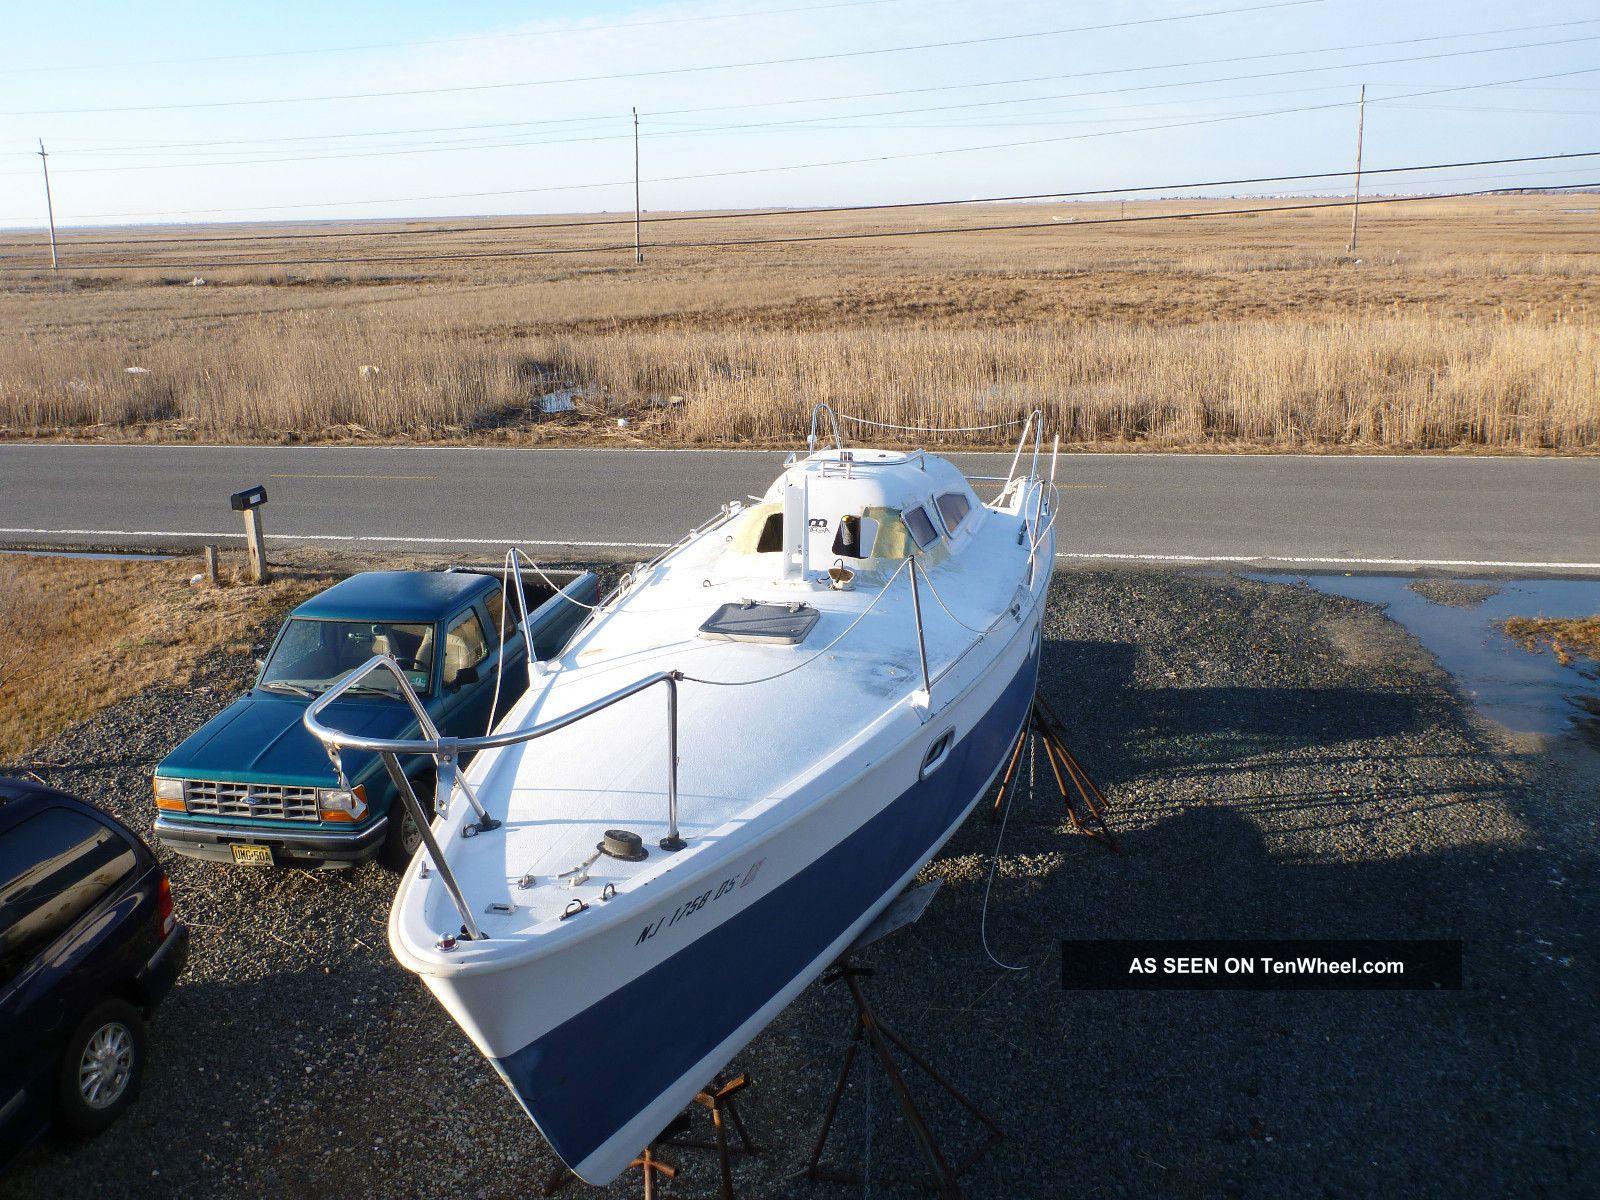 1978 C&c Mega 30 Sailboats 28+ feet photo